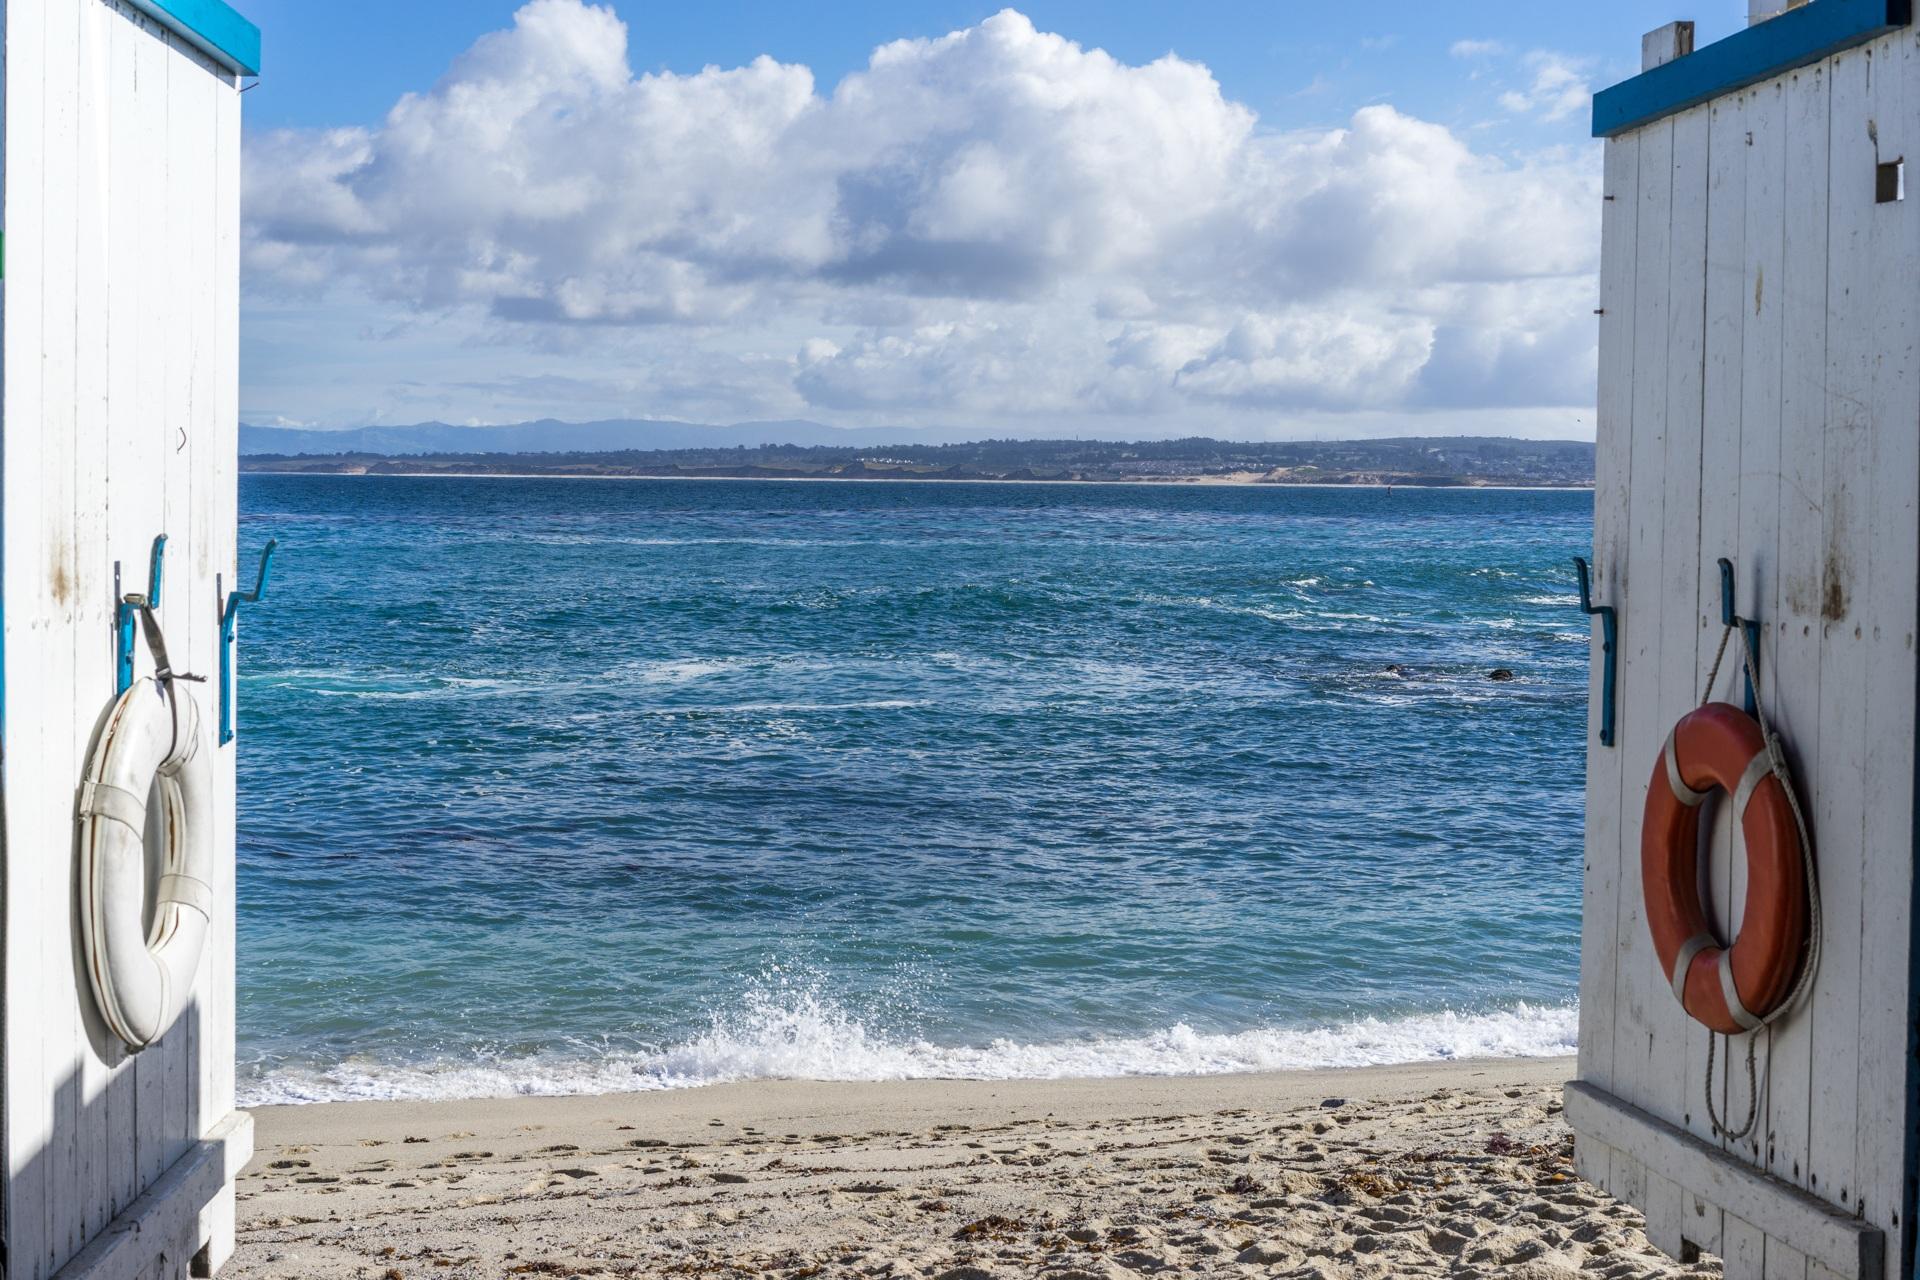 hermosos lugares para visitar en california Visitar Monterey En California Y Sus Puntos De Inters